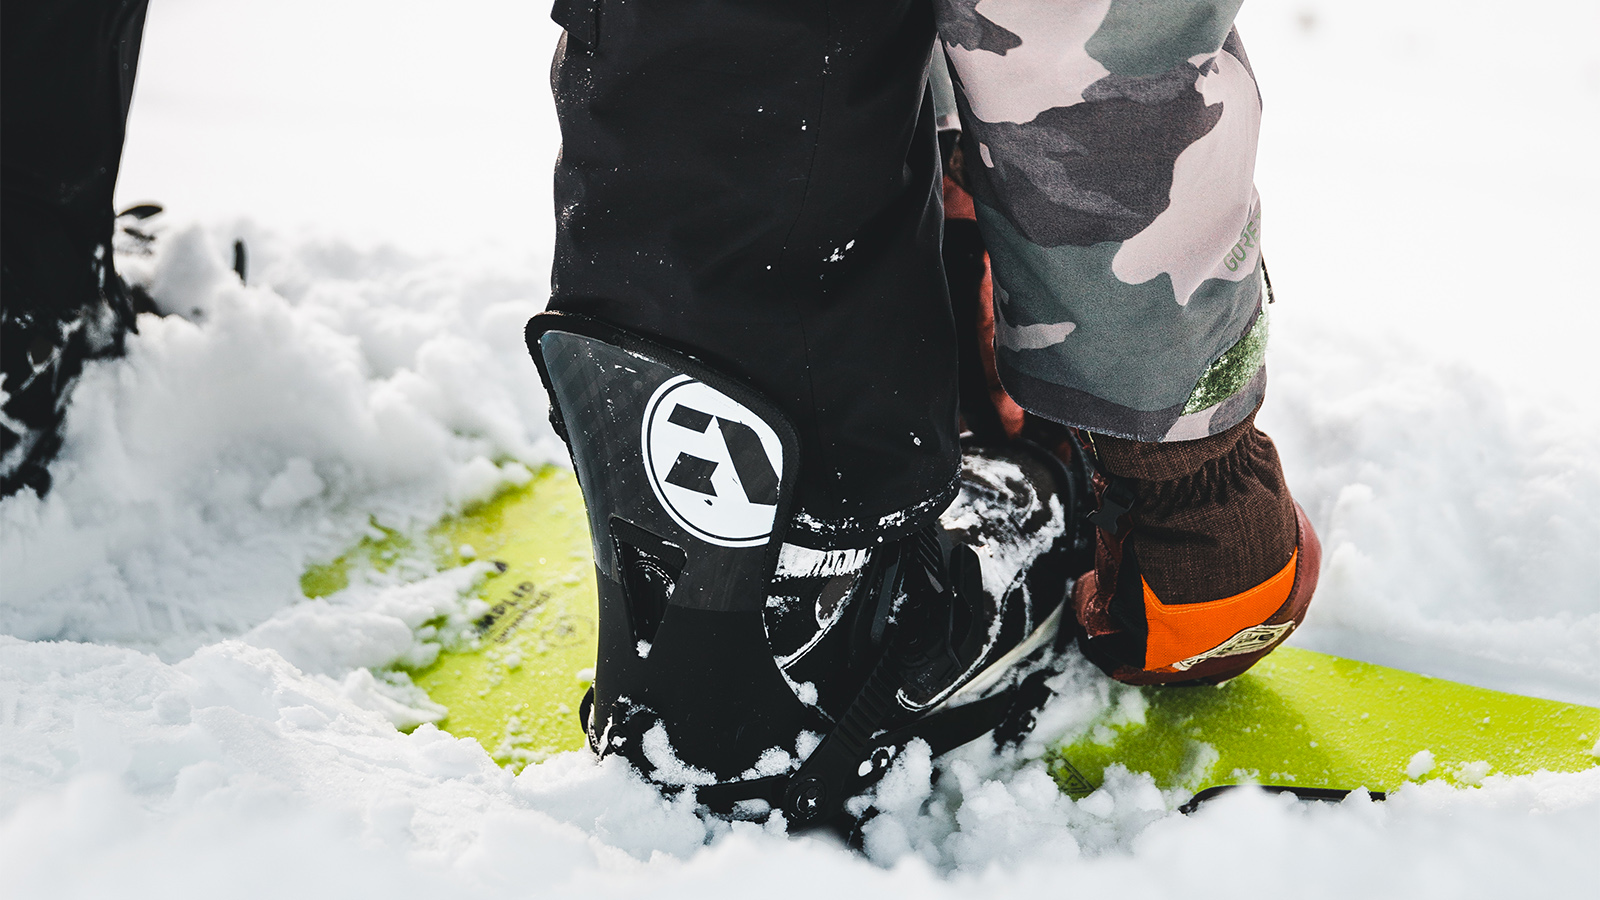 Amplid FW20/21 Snowboard Bindings